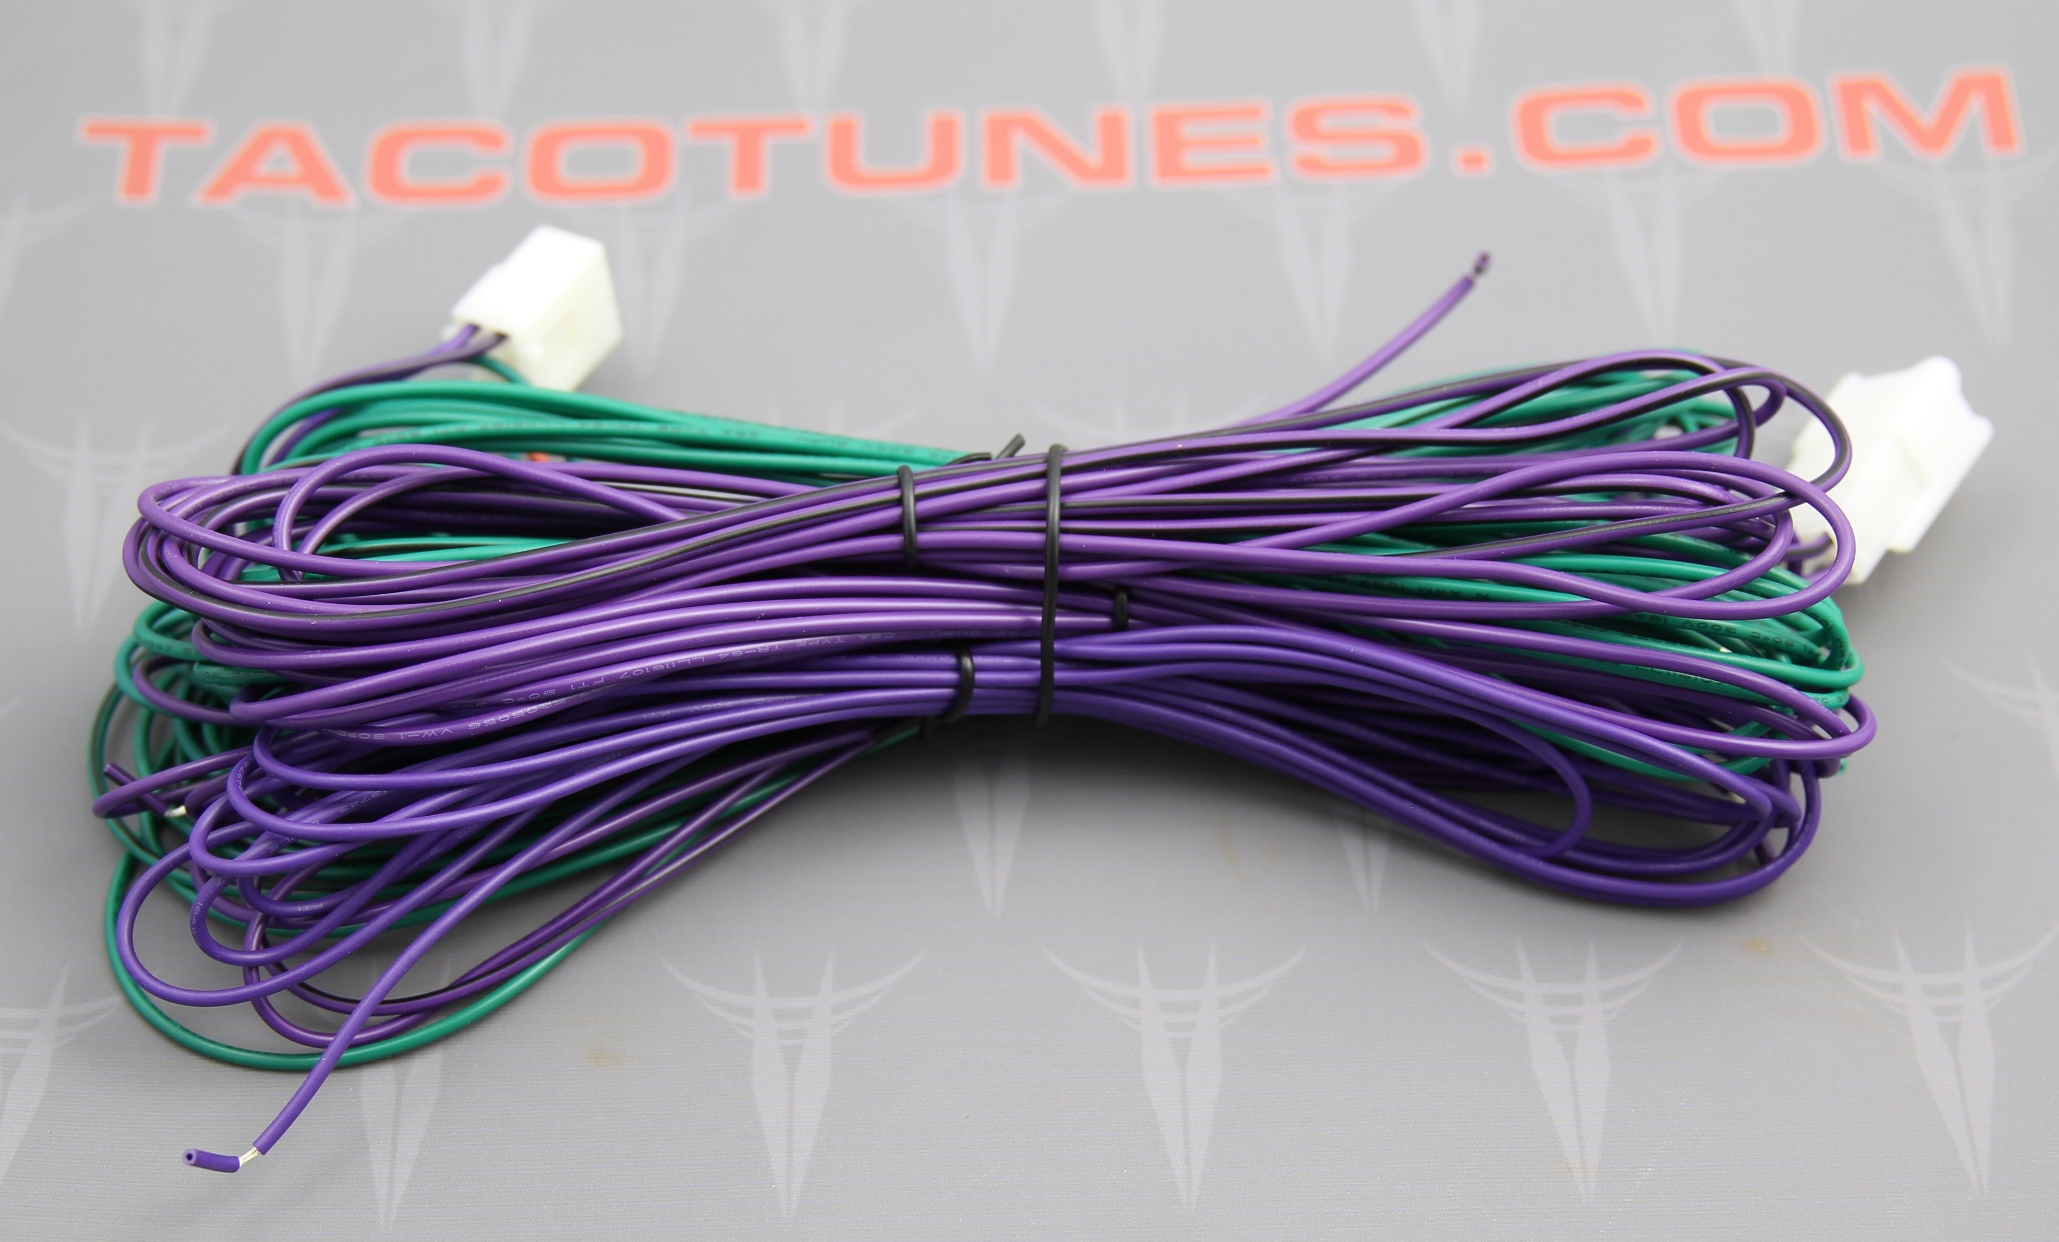 fj cruiser plug play amp harness installation kit add plug play amplifier head unit interface non jbl 6 pin wire harness